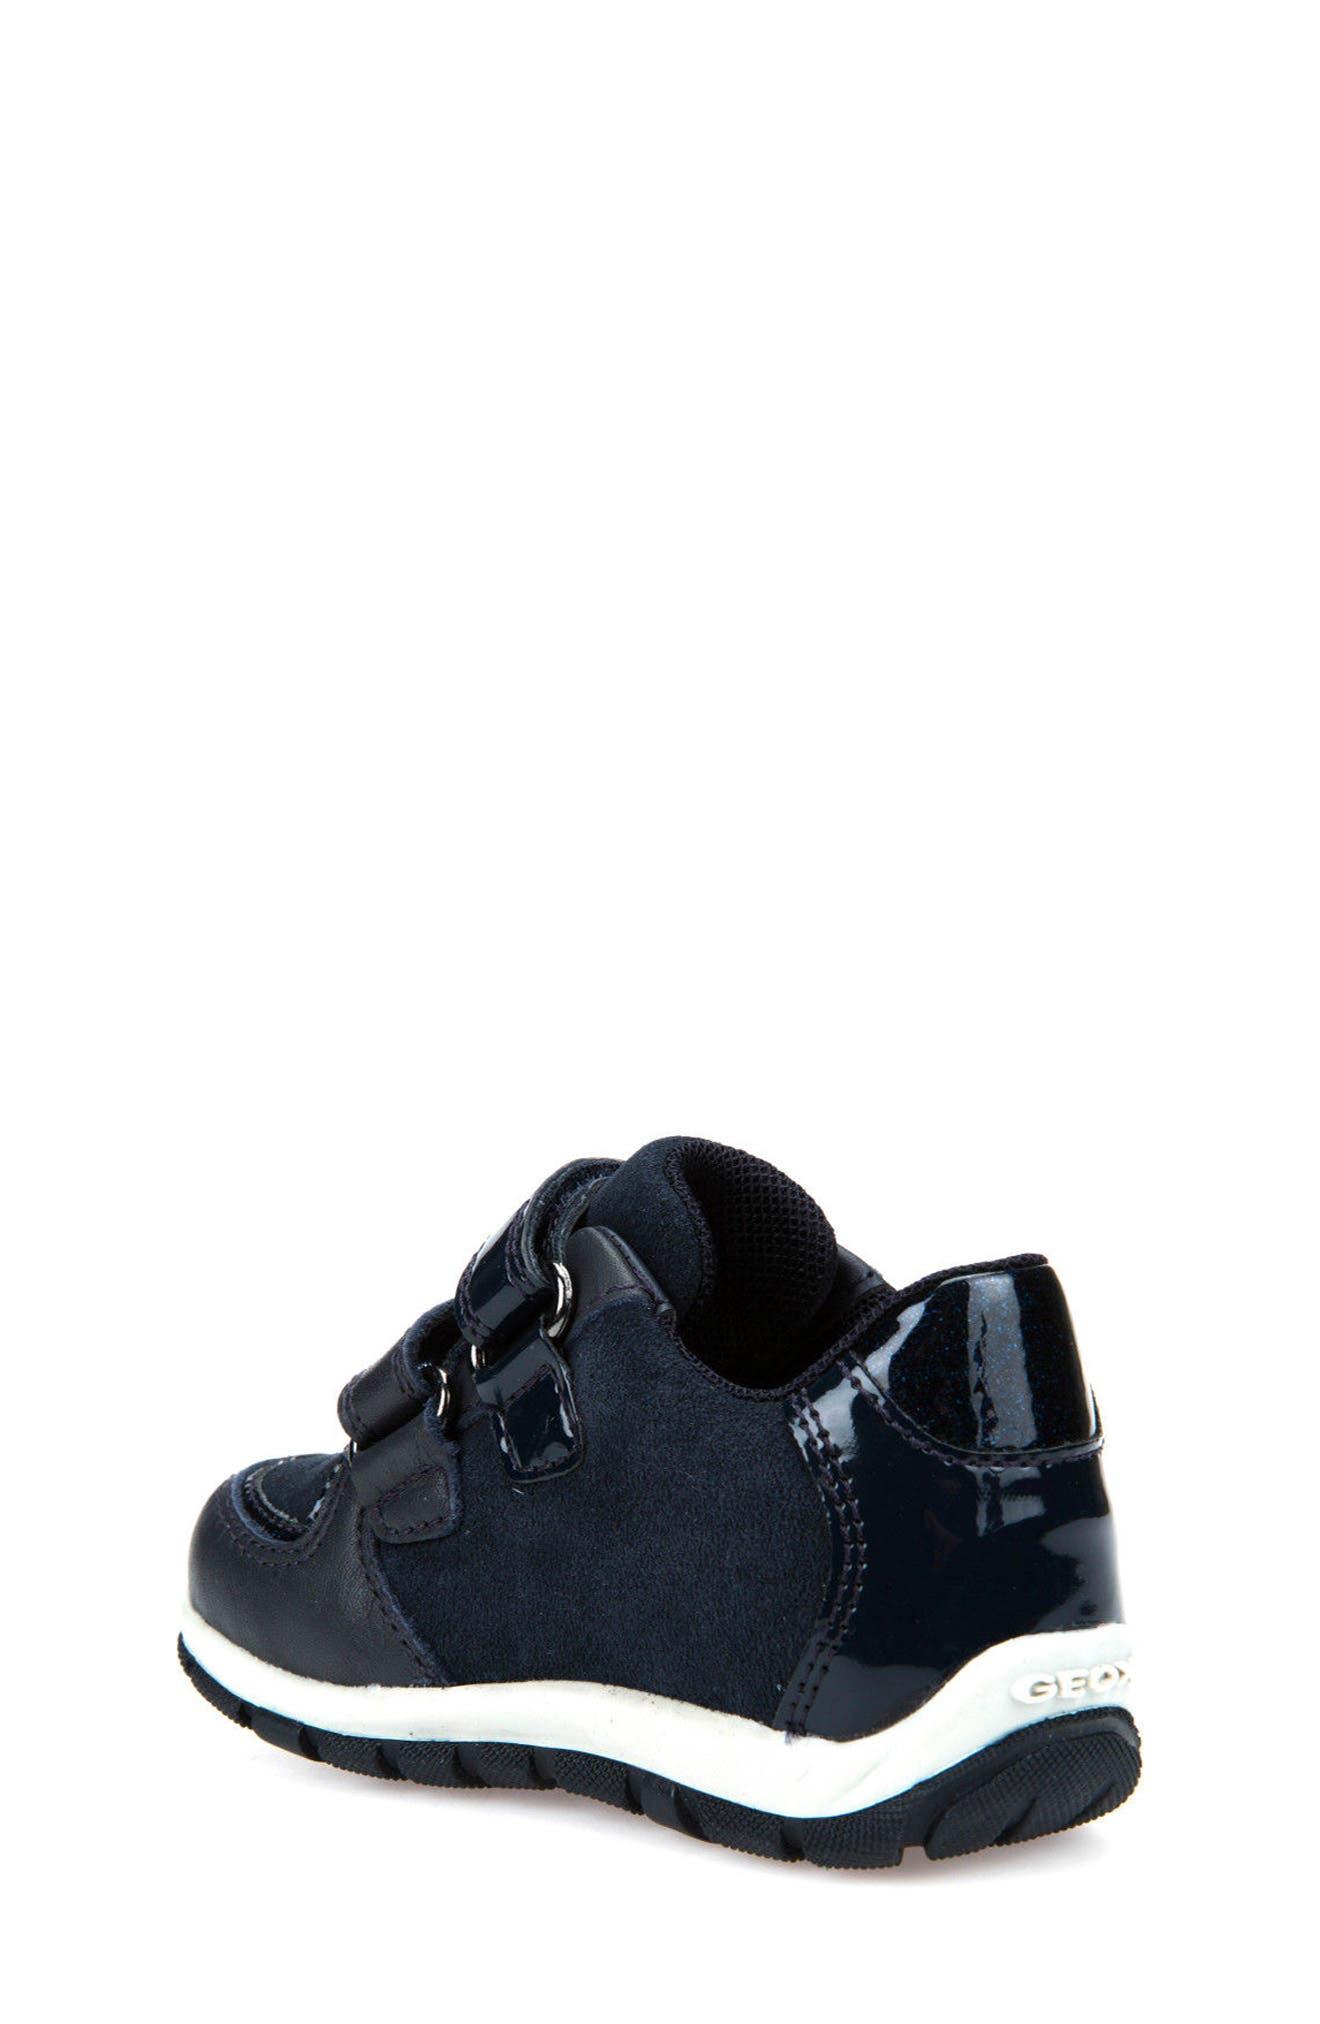 Shaax Love Sneaker,                             Alternate thumbnail 2, color,                             410